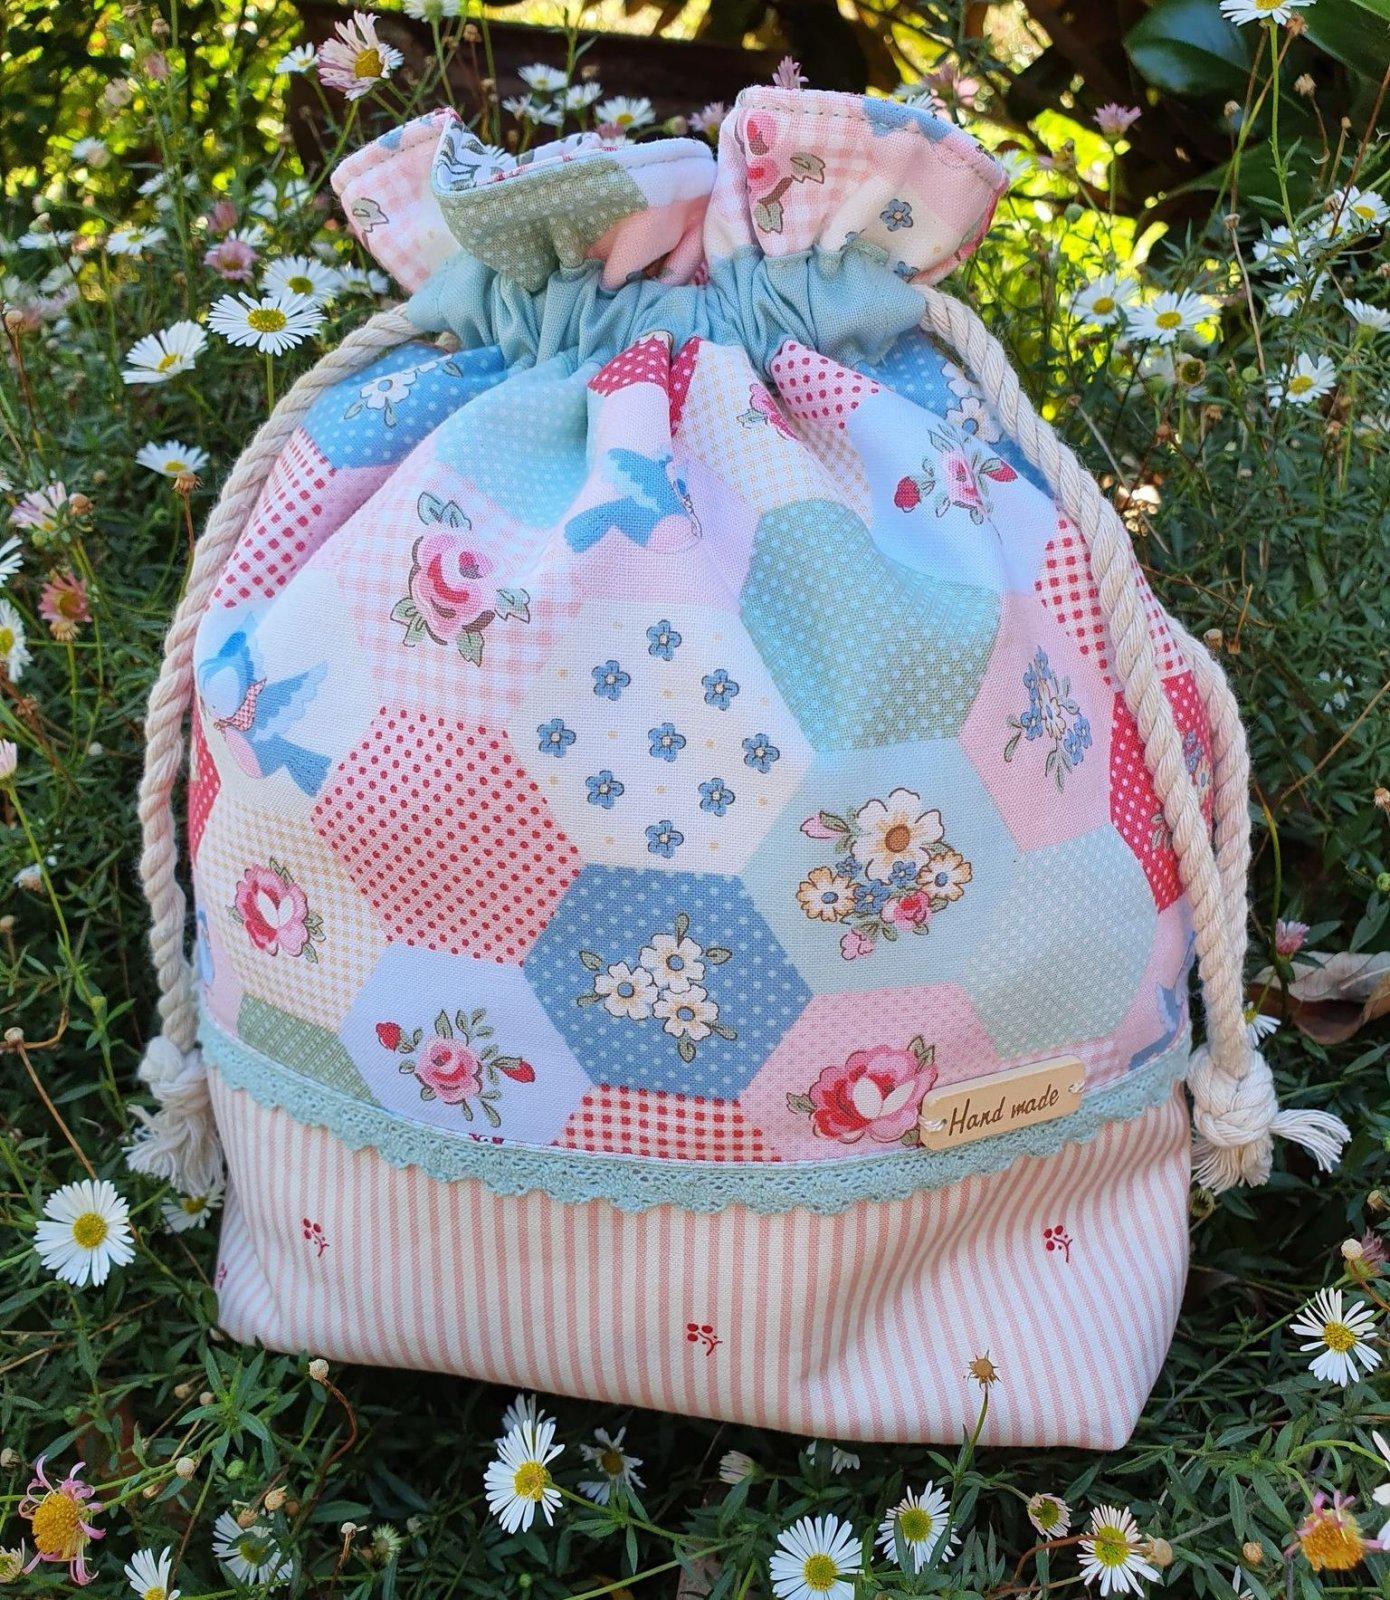 Poppie's Drawstring Bag kit